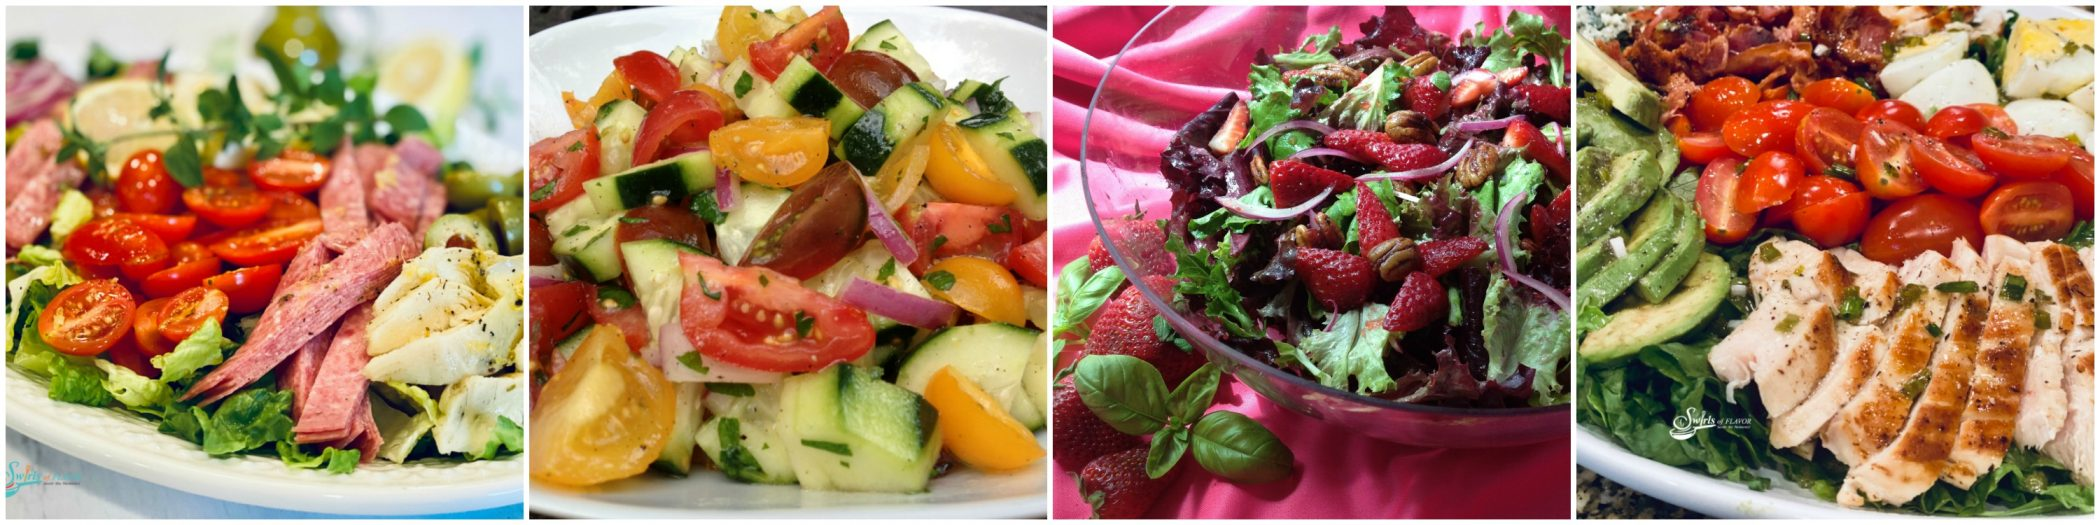 Left to Right: Italian Chopped Salad; Heirloom Tomato Cucumber Salad; Strawberry Baby Greens Salad; Cobb Salad